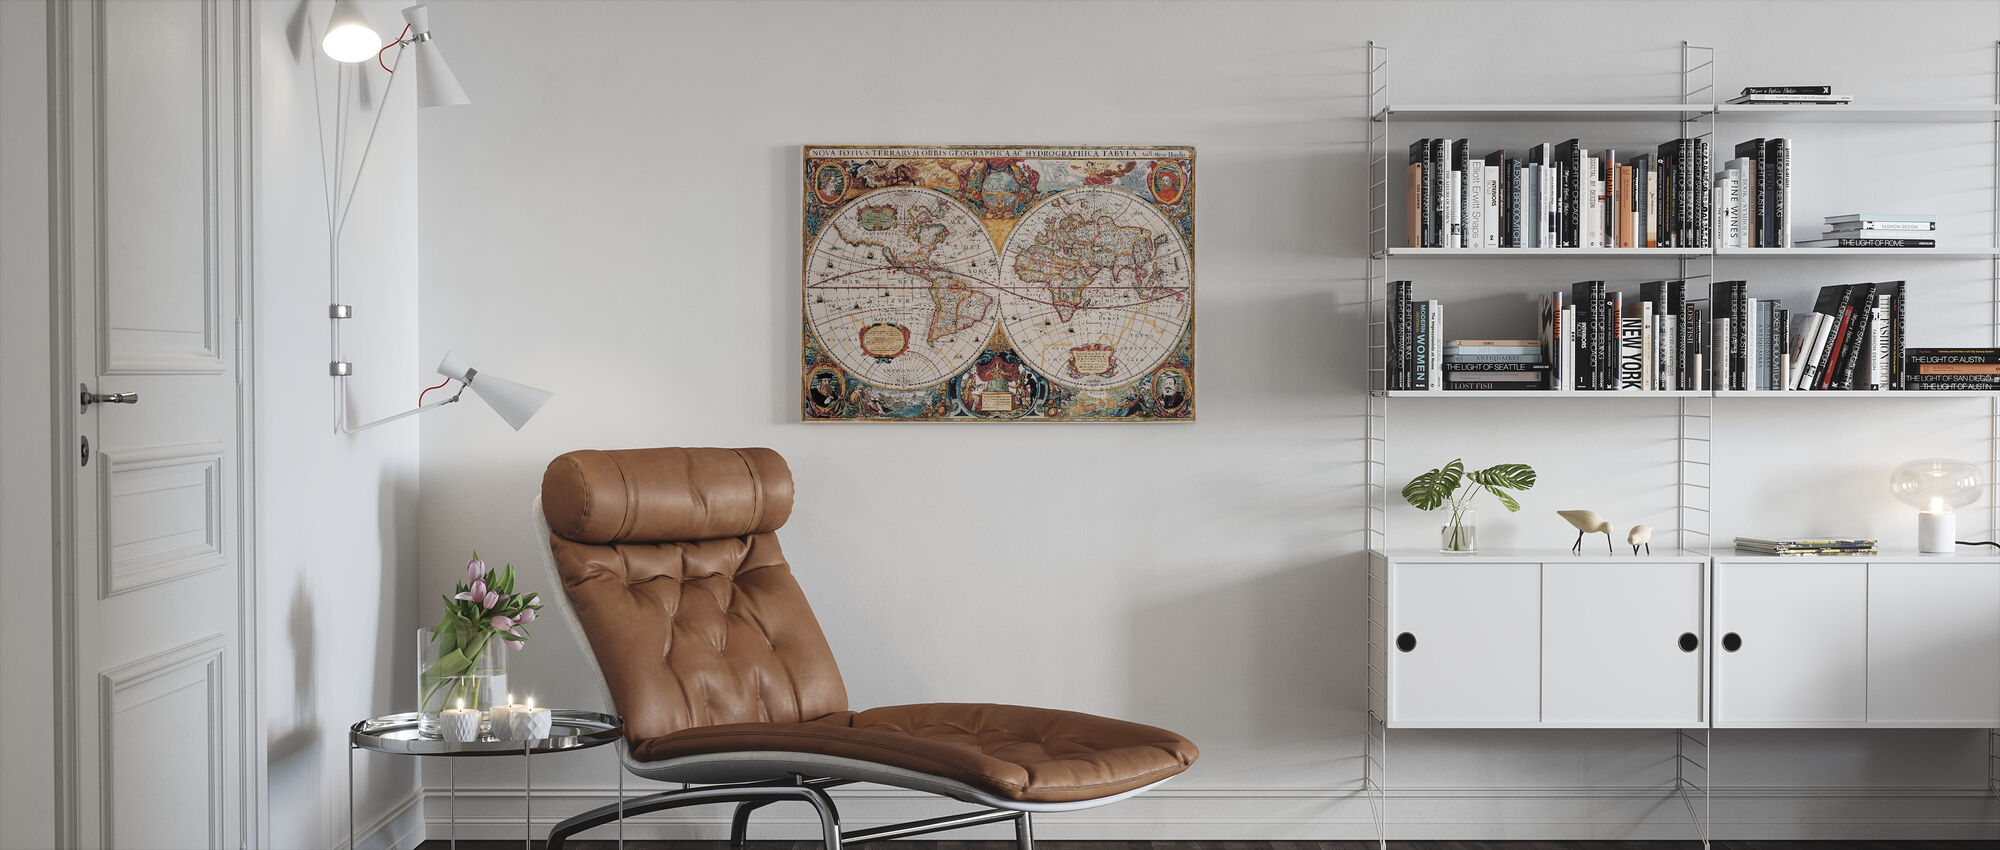 Carte antique - Henricus Hondius 1630 - Impression sur toile - Salle à manger